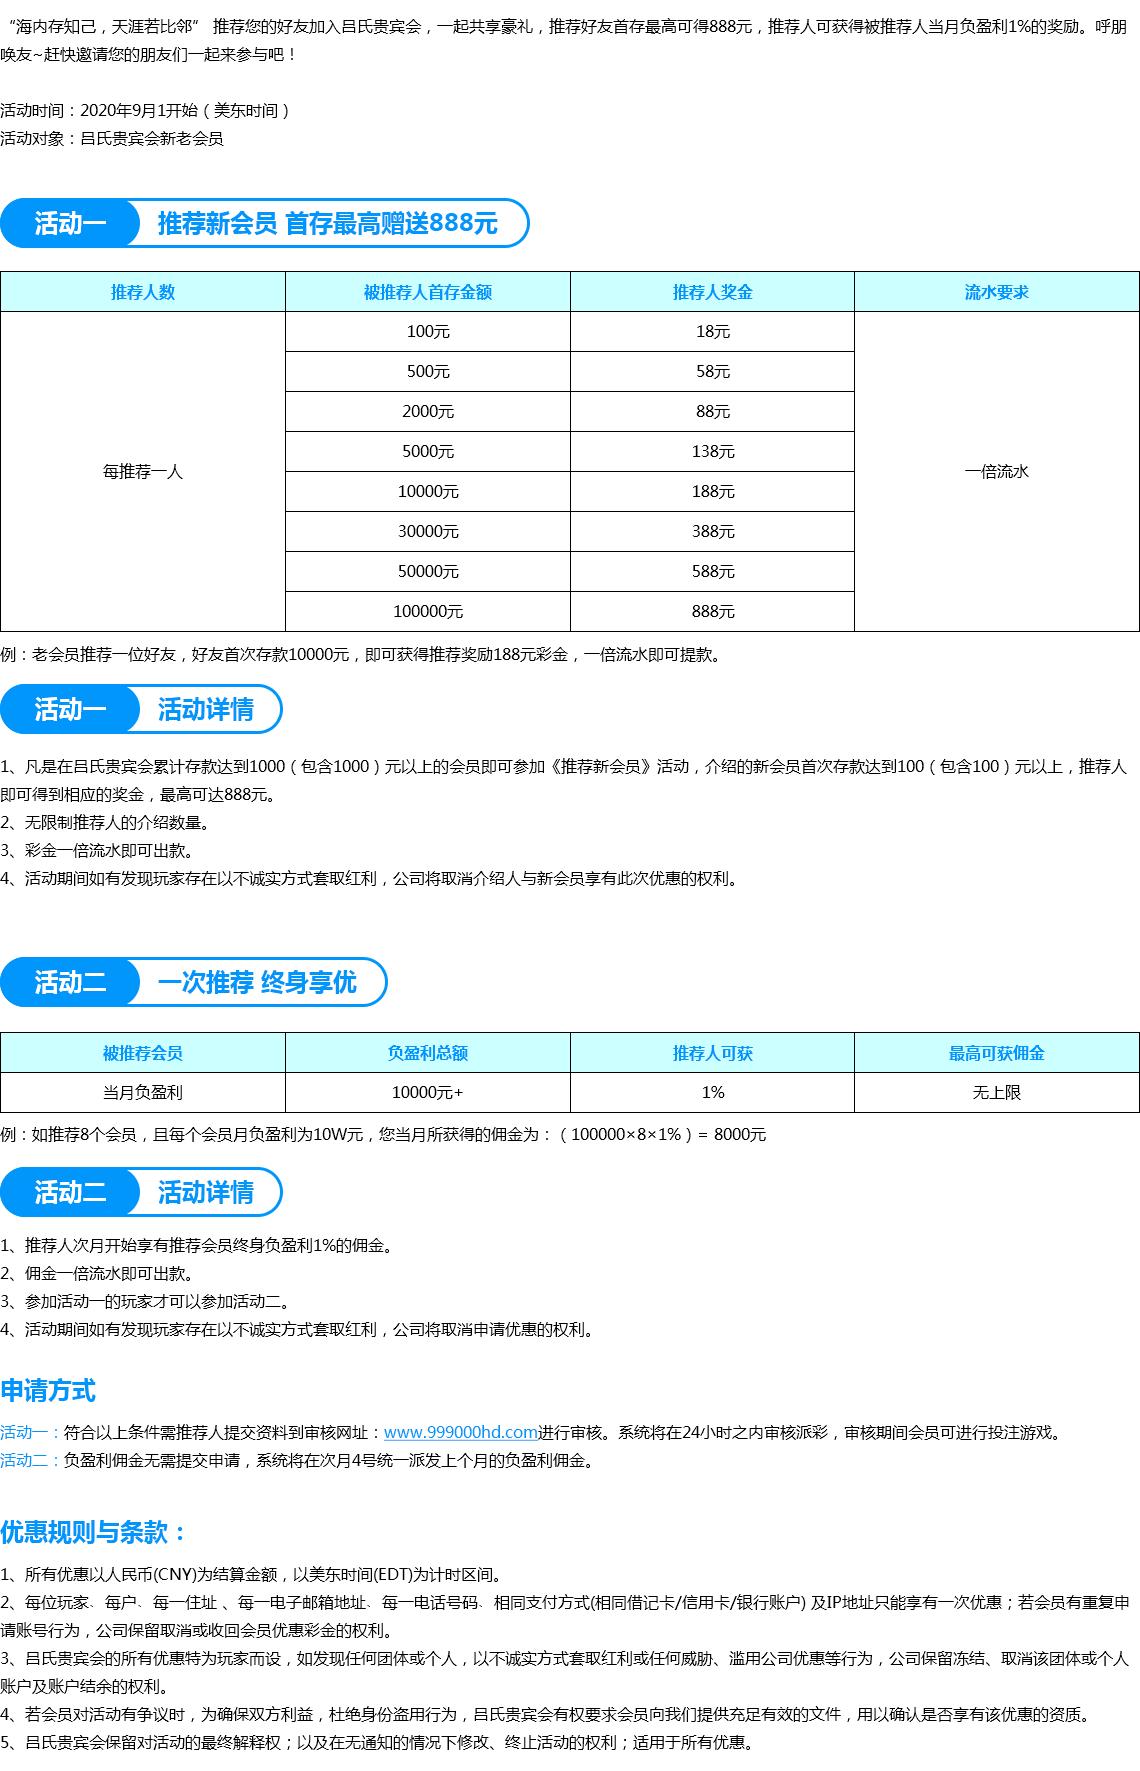 https://yun-ni.vip/999000hd/0022hd20200831.png